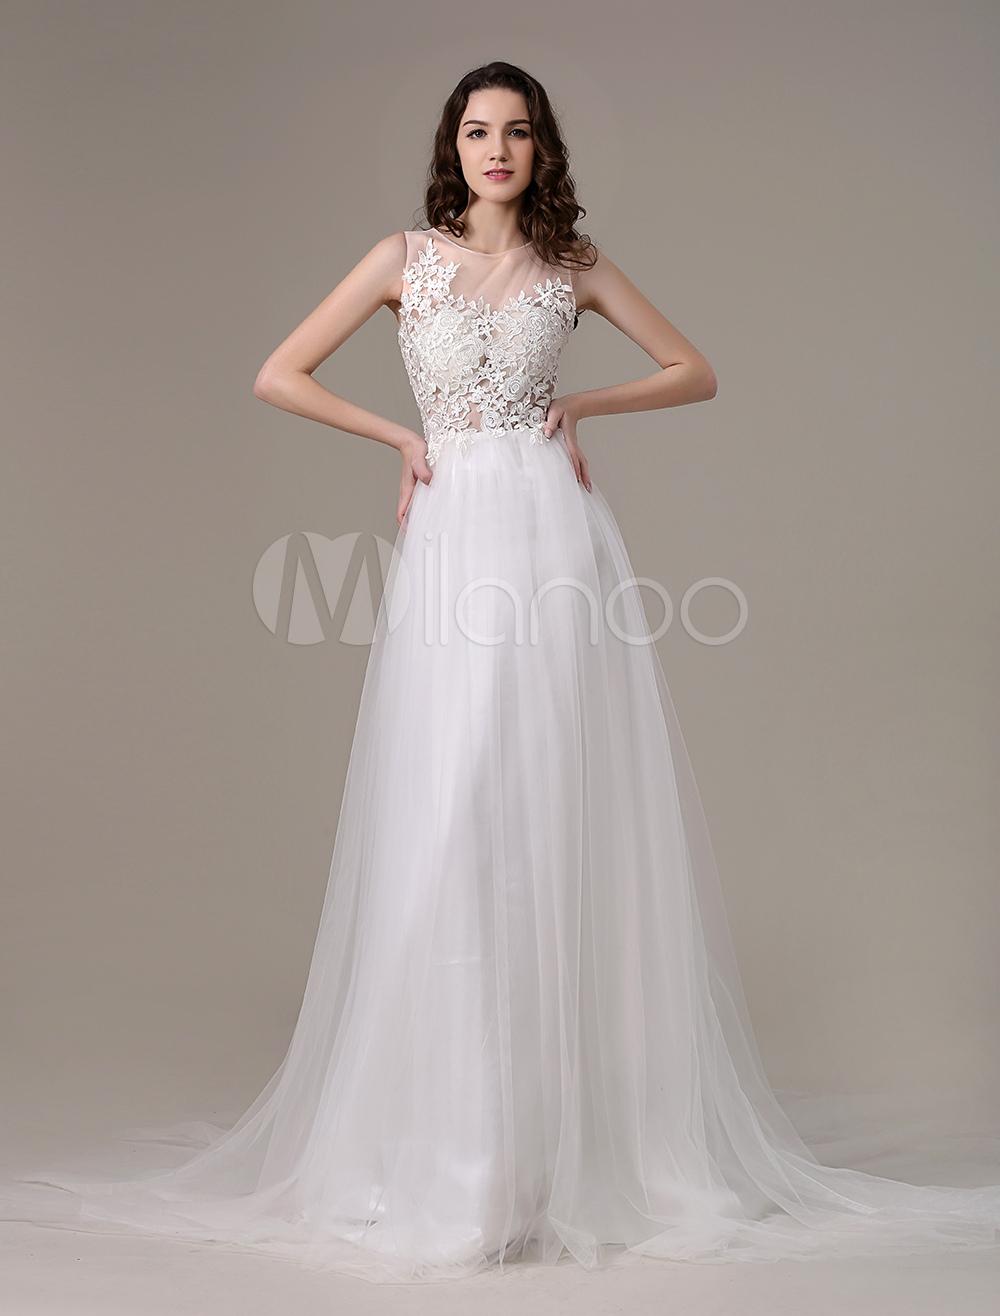 White Prom Dresses 2018 Long Ivory Princess Evening Dress Lace ...